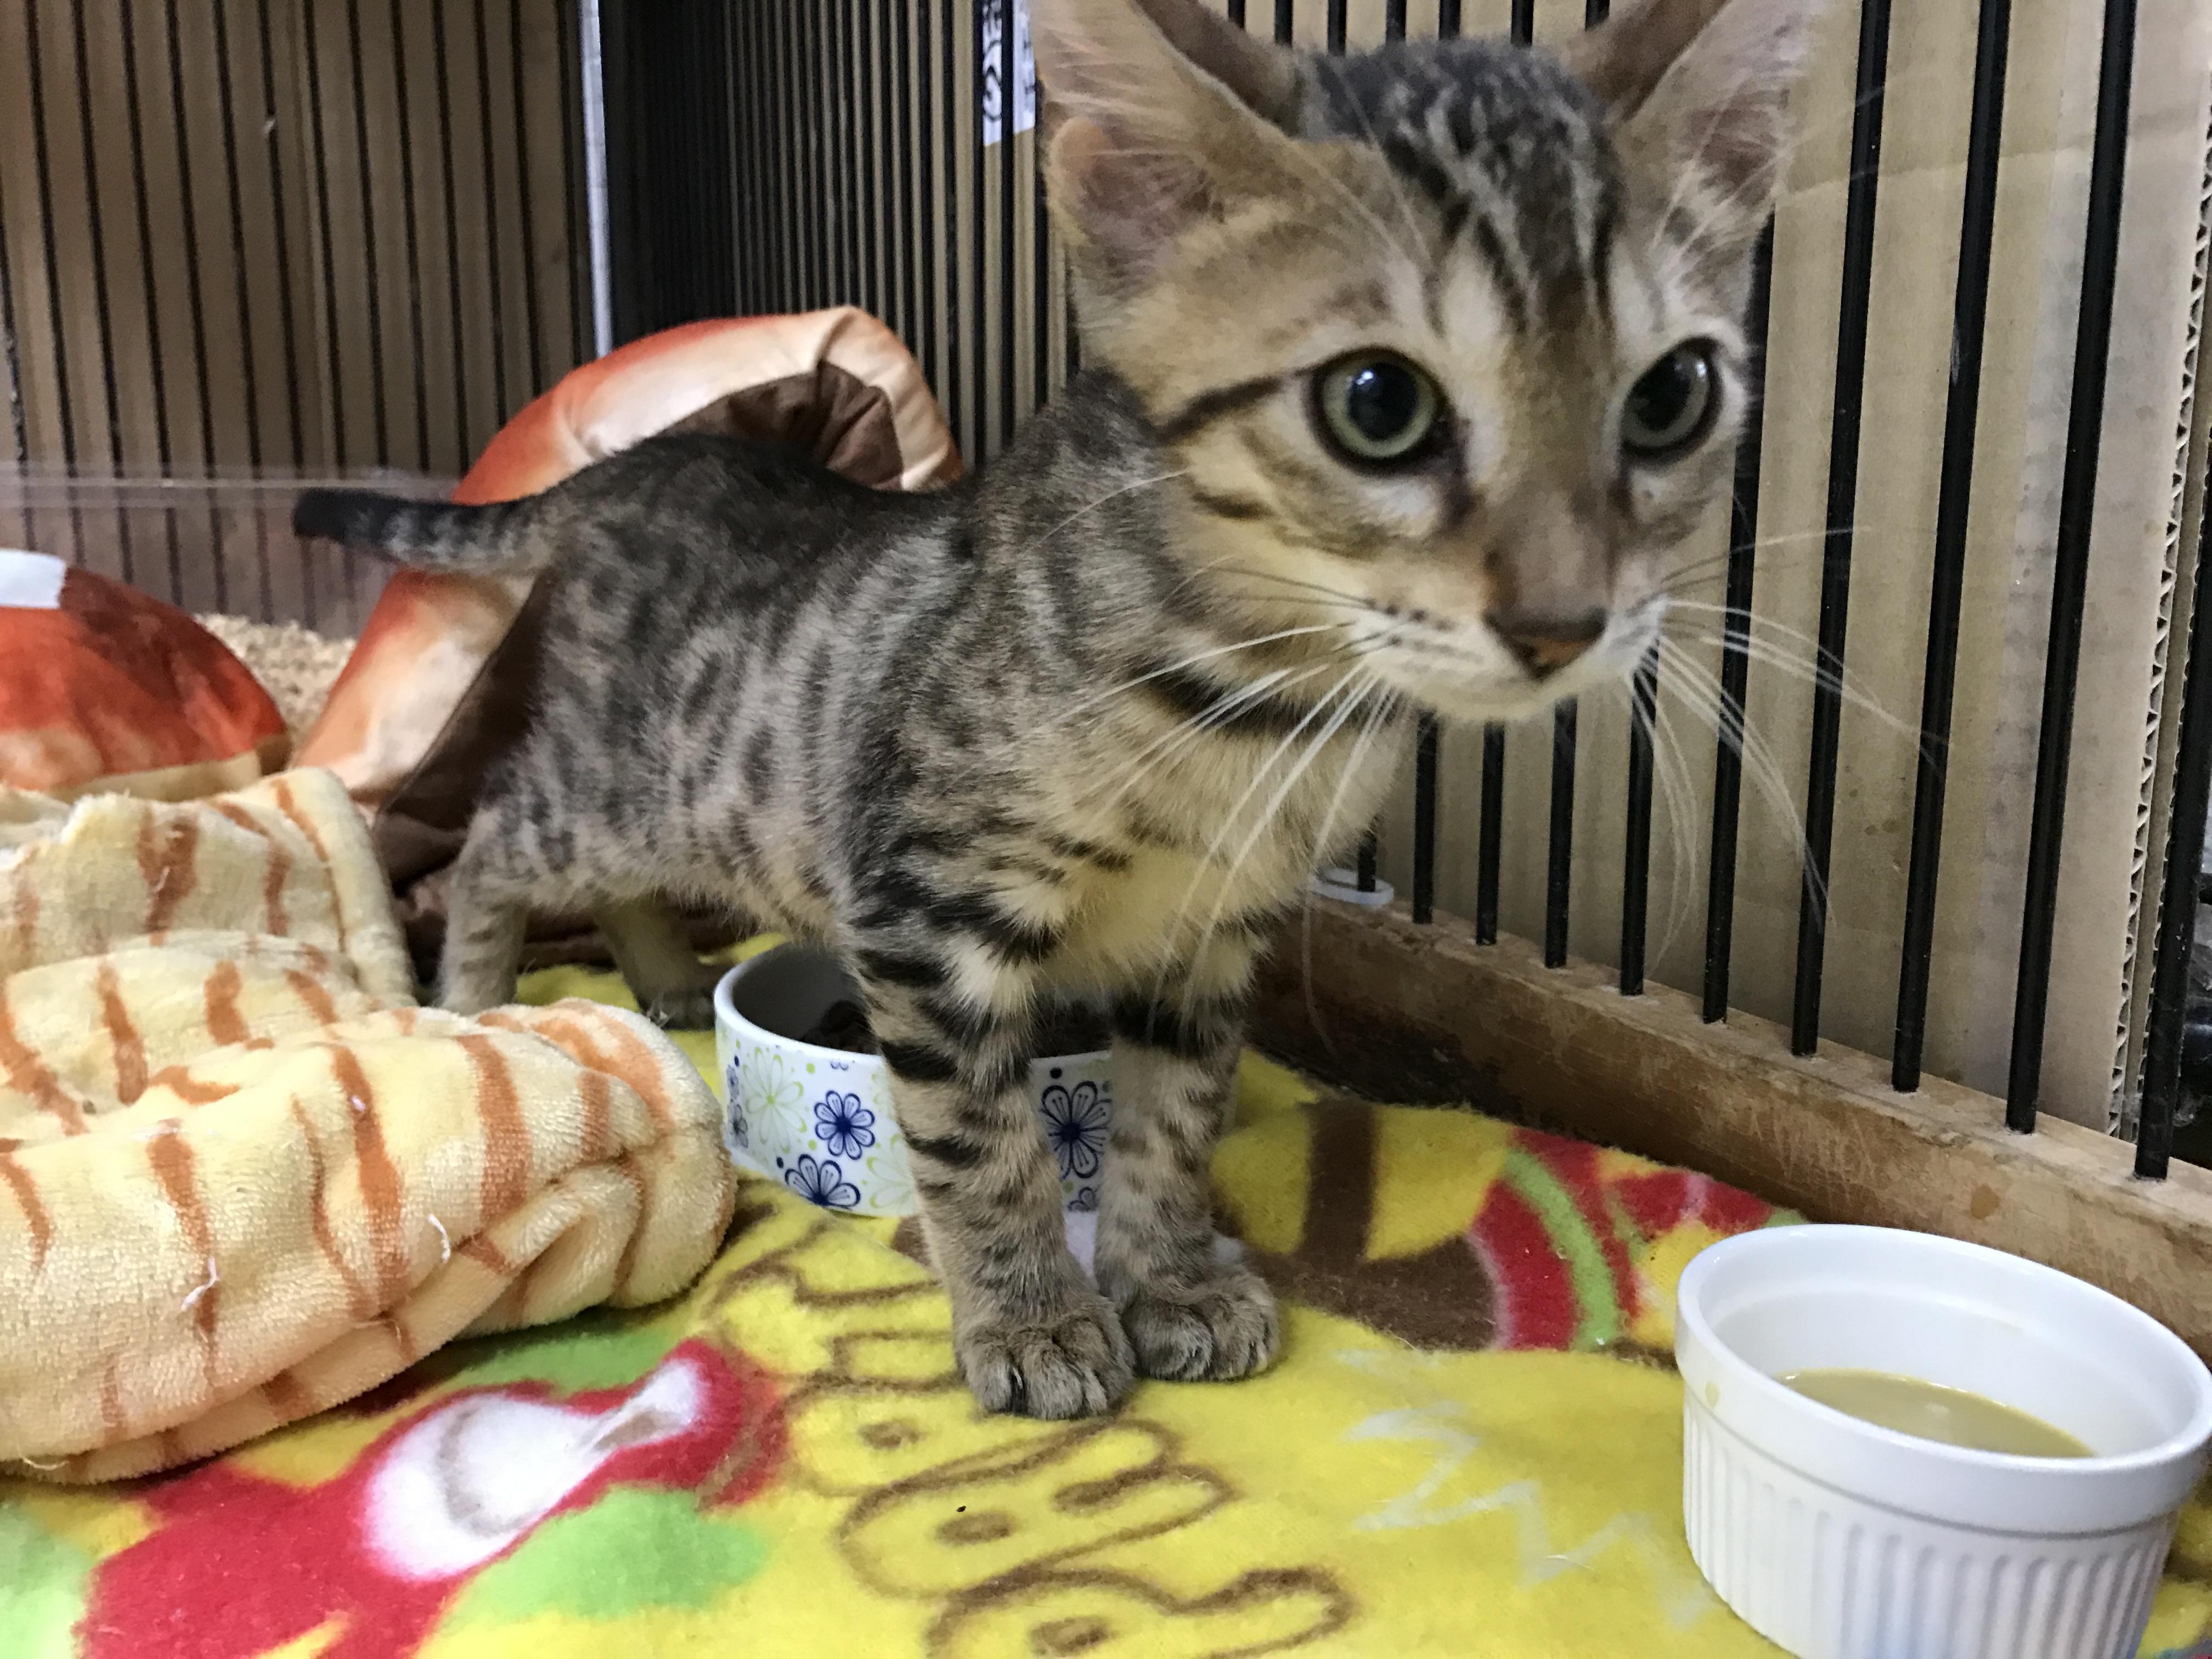 LOVE CAT♪ベンガル着弾ッ!!@インター小動物